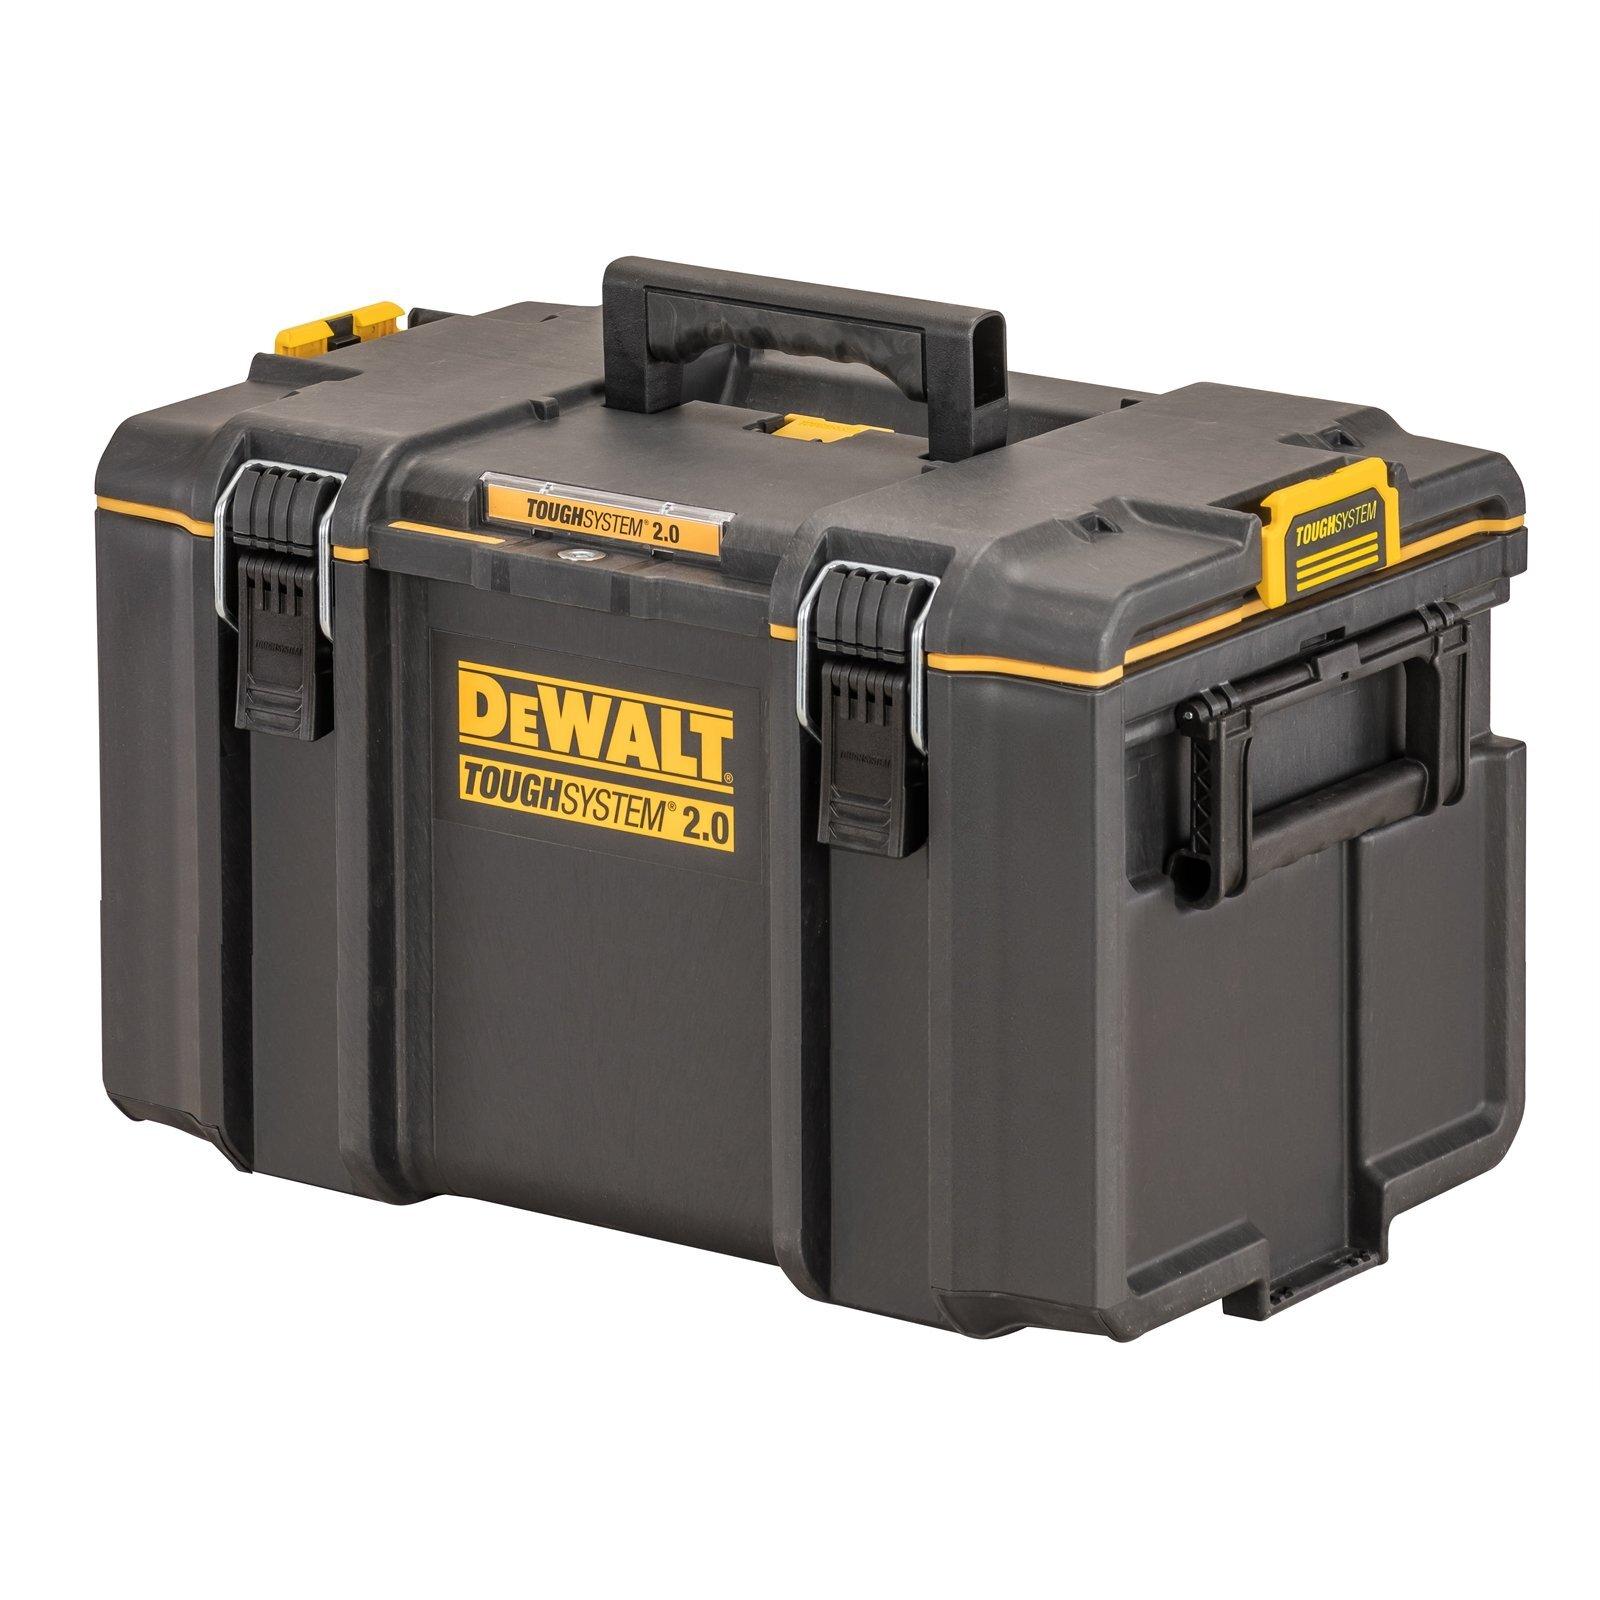 Dewalt Toughsystem 2.0 Deep Tool Box